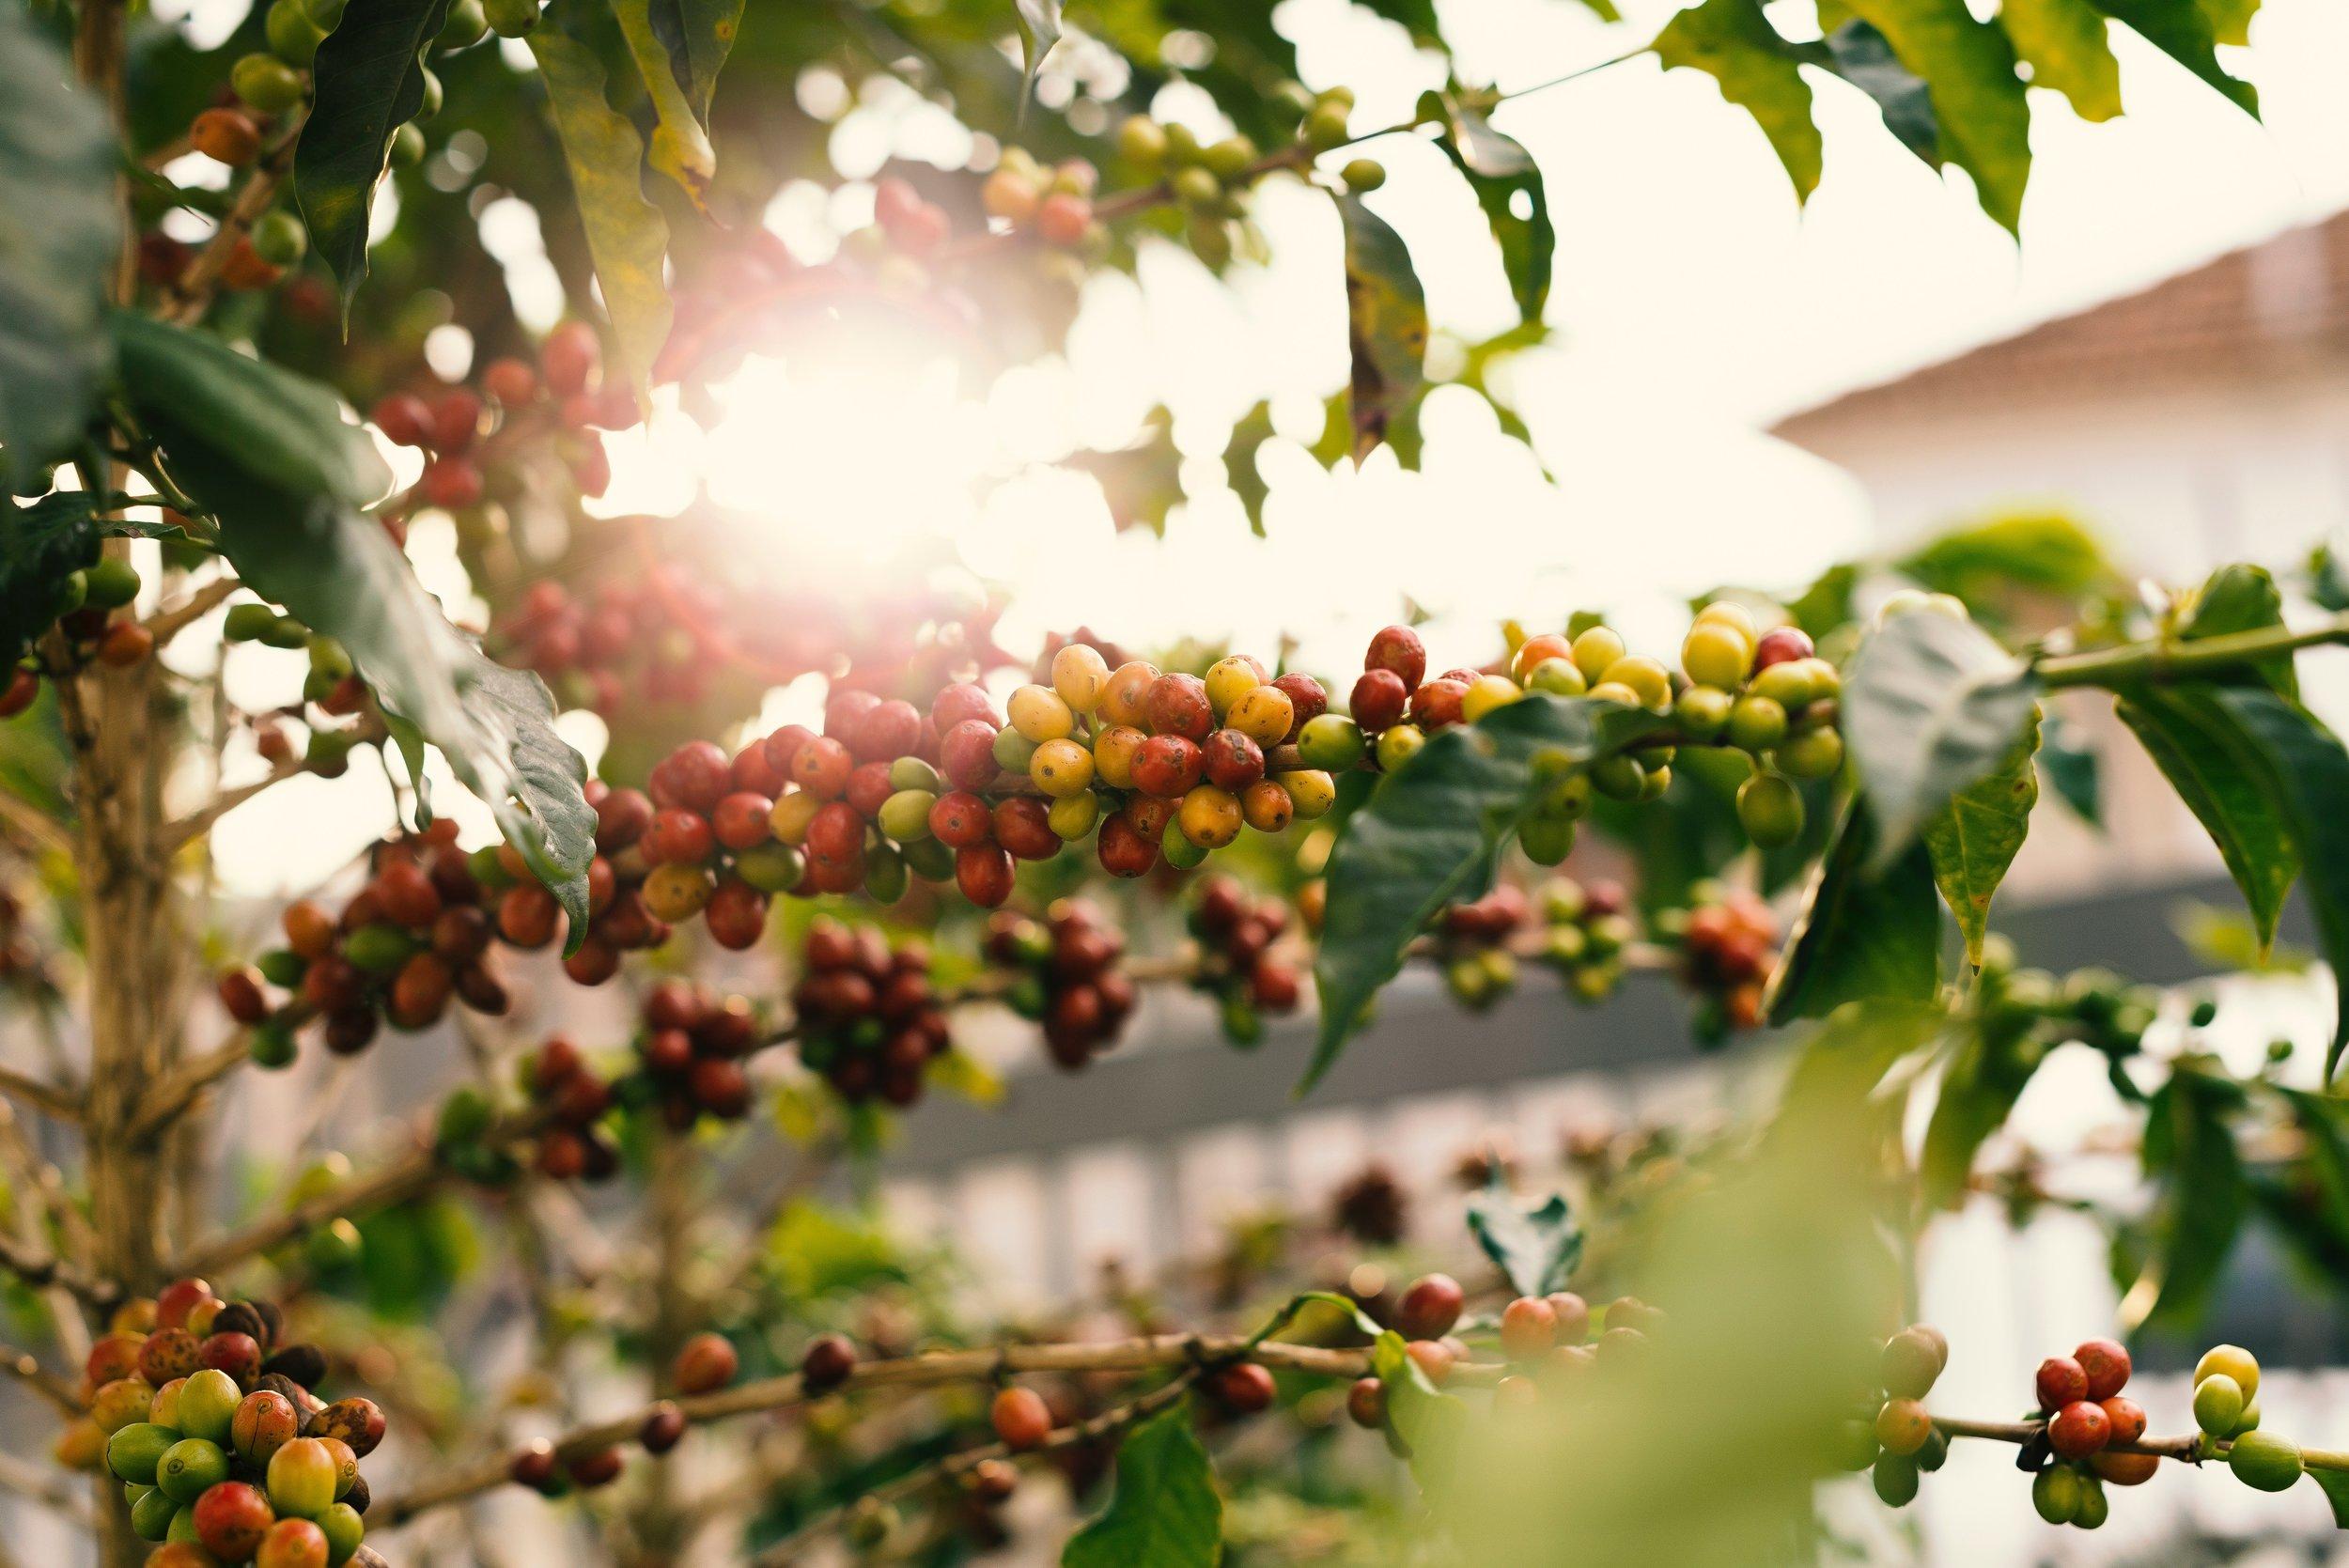 berries-blur-branch-1556665.jpg